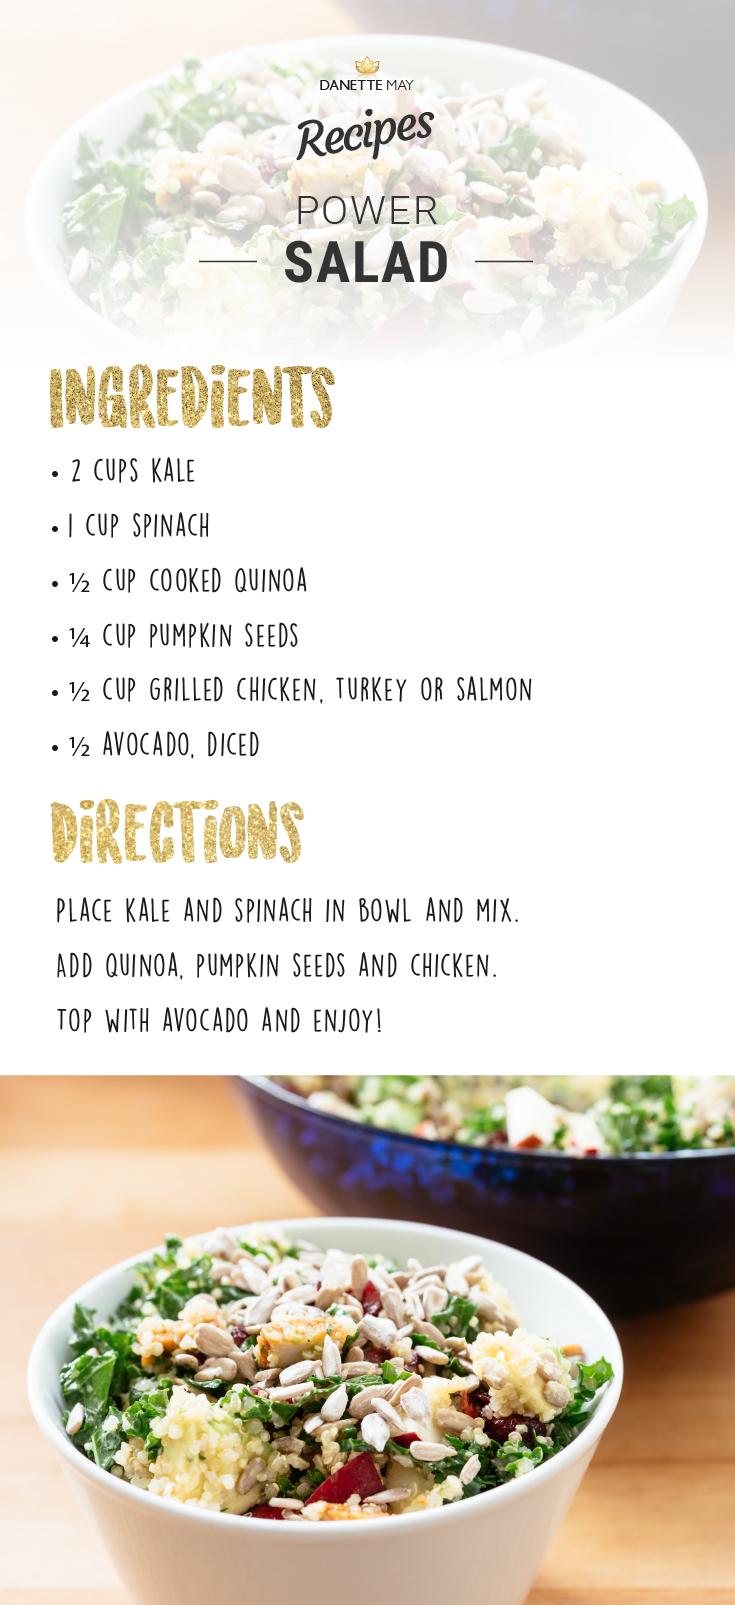 Danette May Recipe Kale Salad